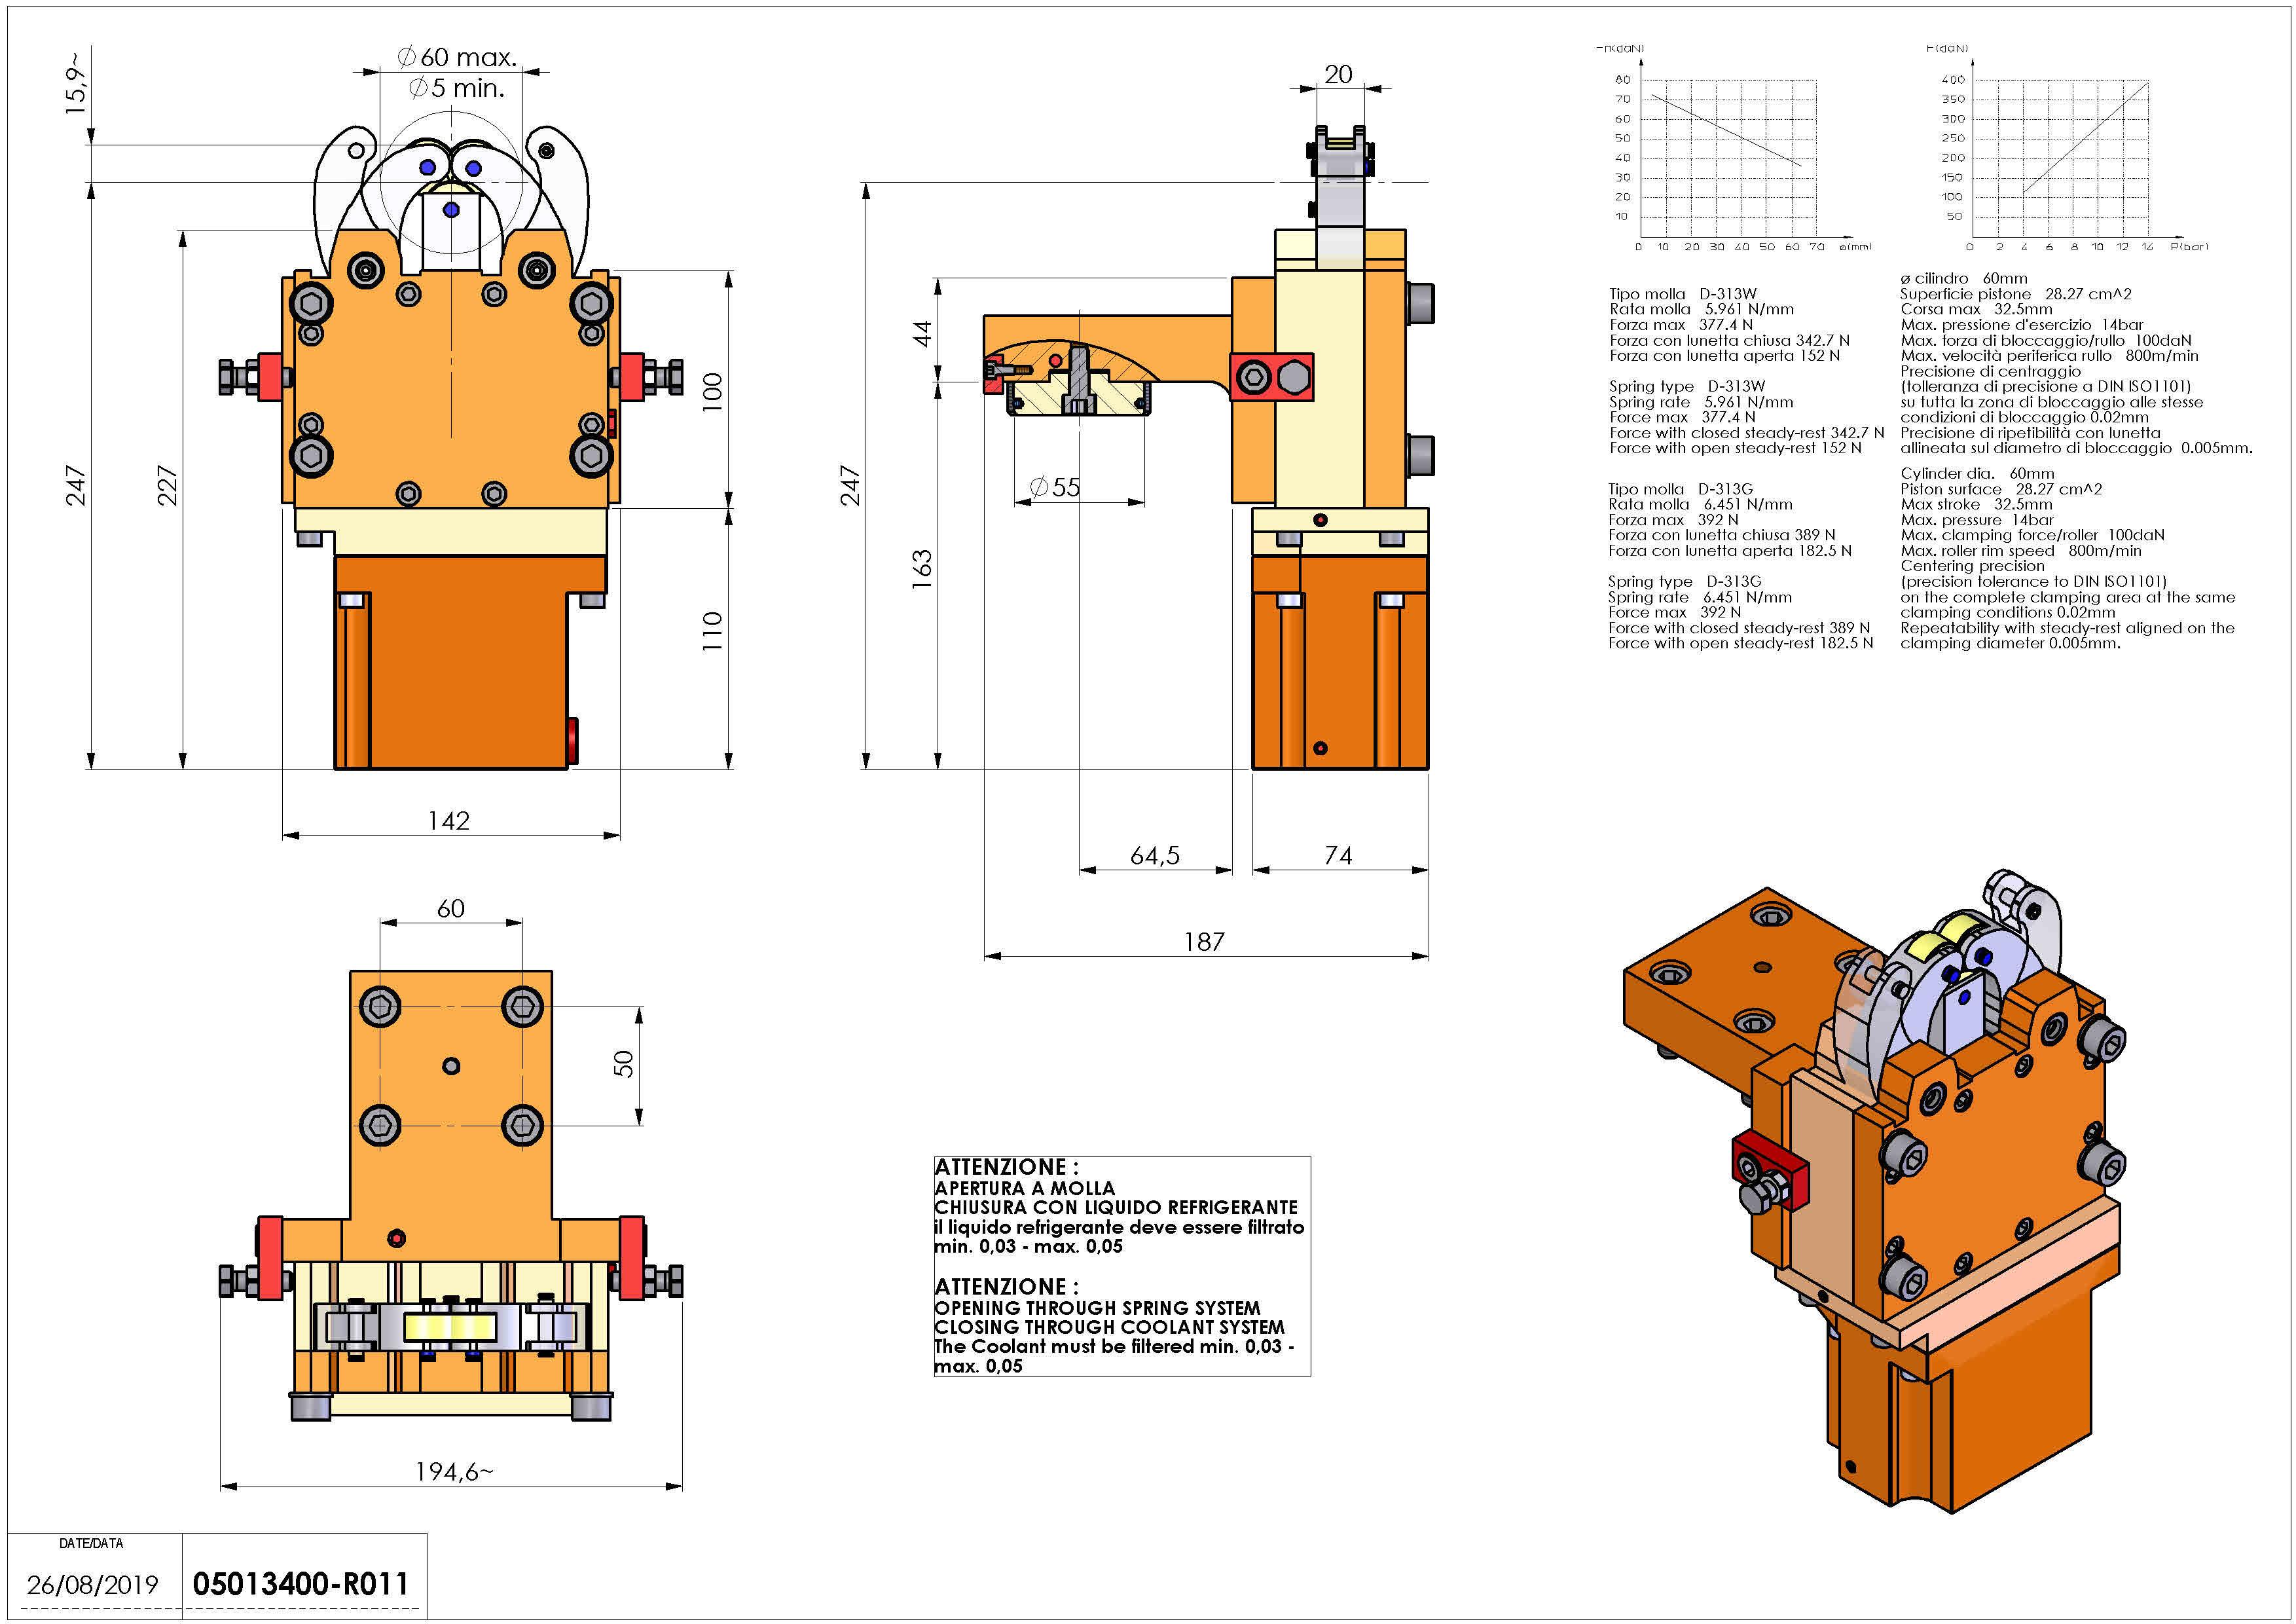 Technical image - LUNETTA D55 H84.